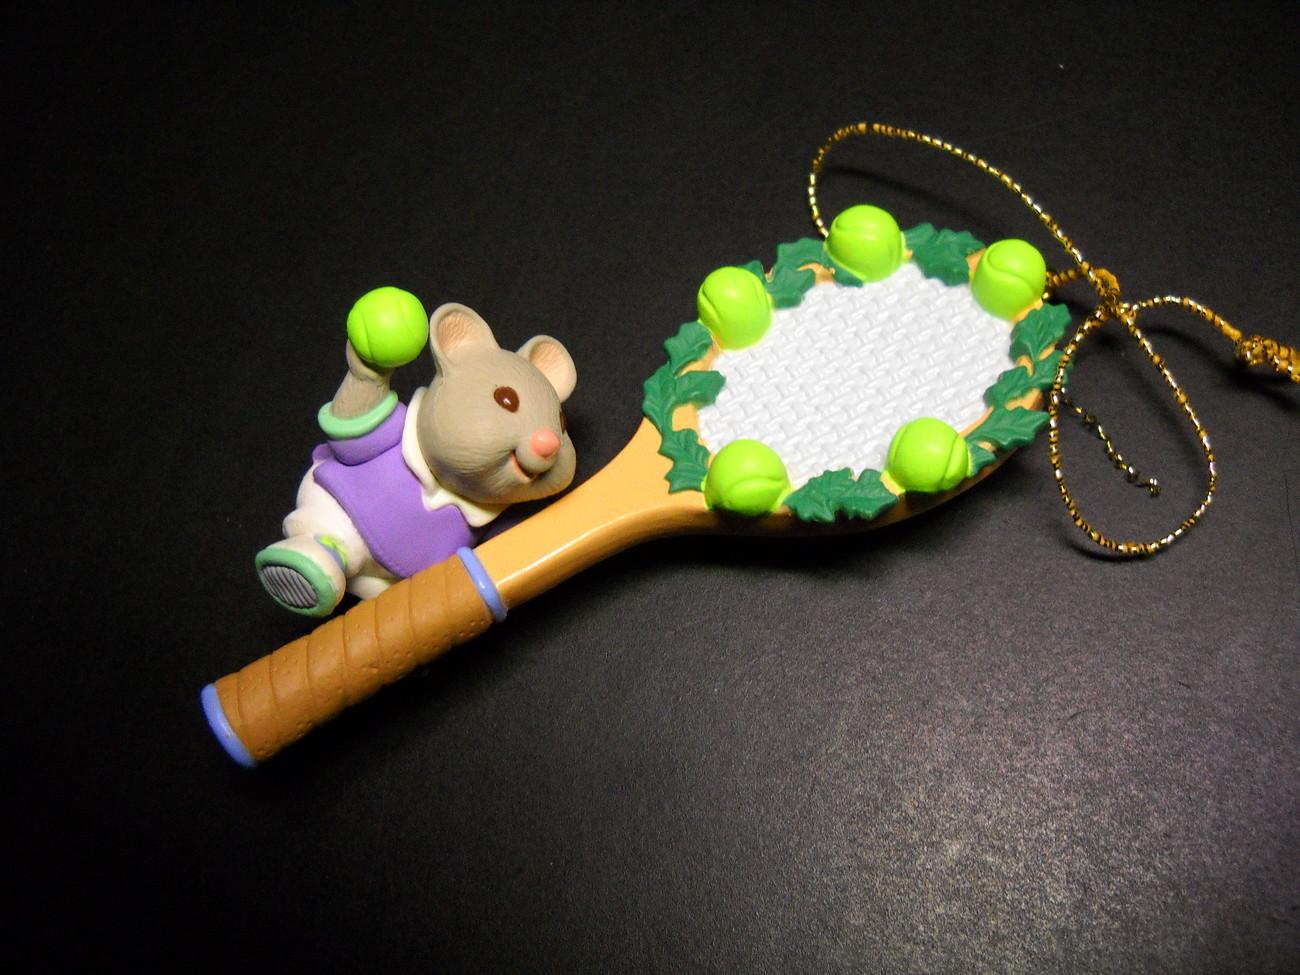 Christmas ornament hallmark keepsake tennis anyone 1995 04